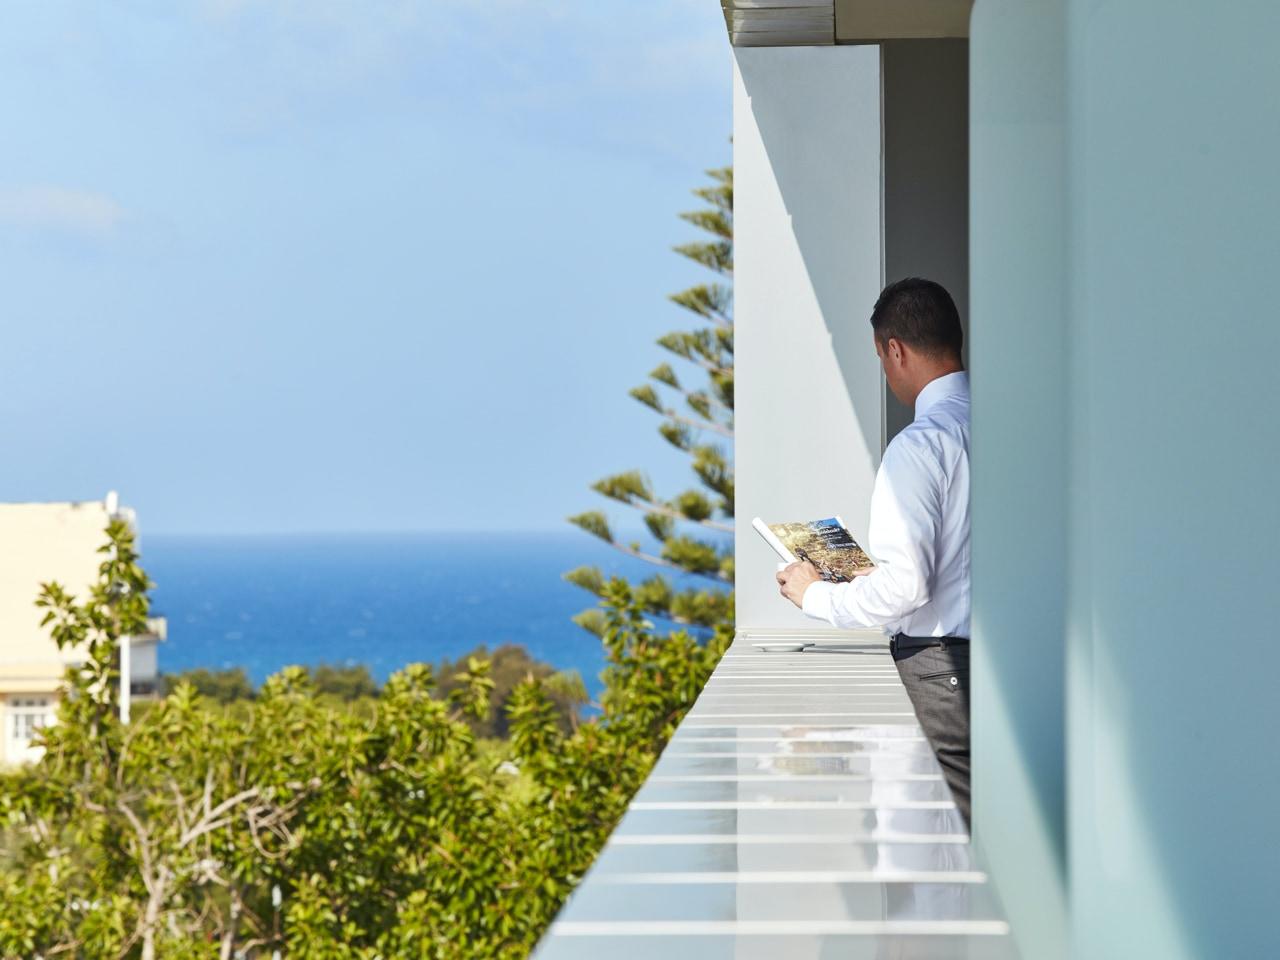 Galaxy Hotel In Heraklion Crete - Your Best Option To Explore Heraklion & Knossos Minoan Palace